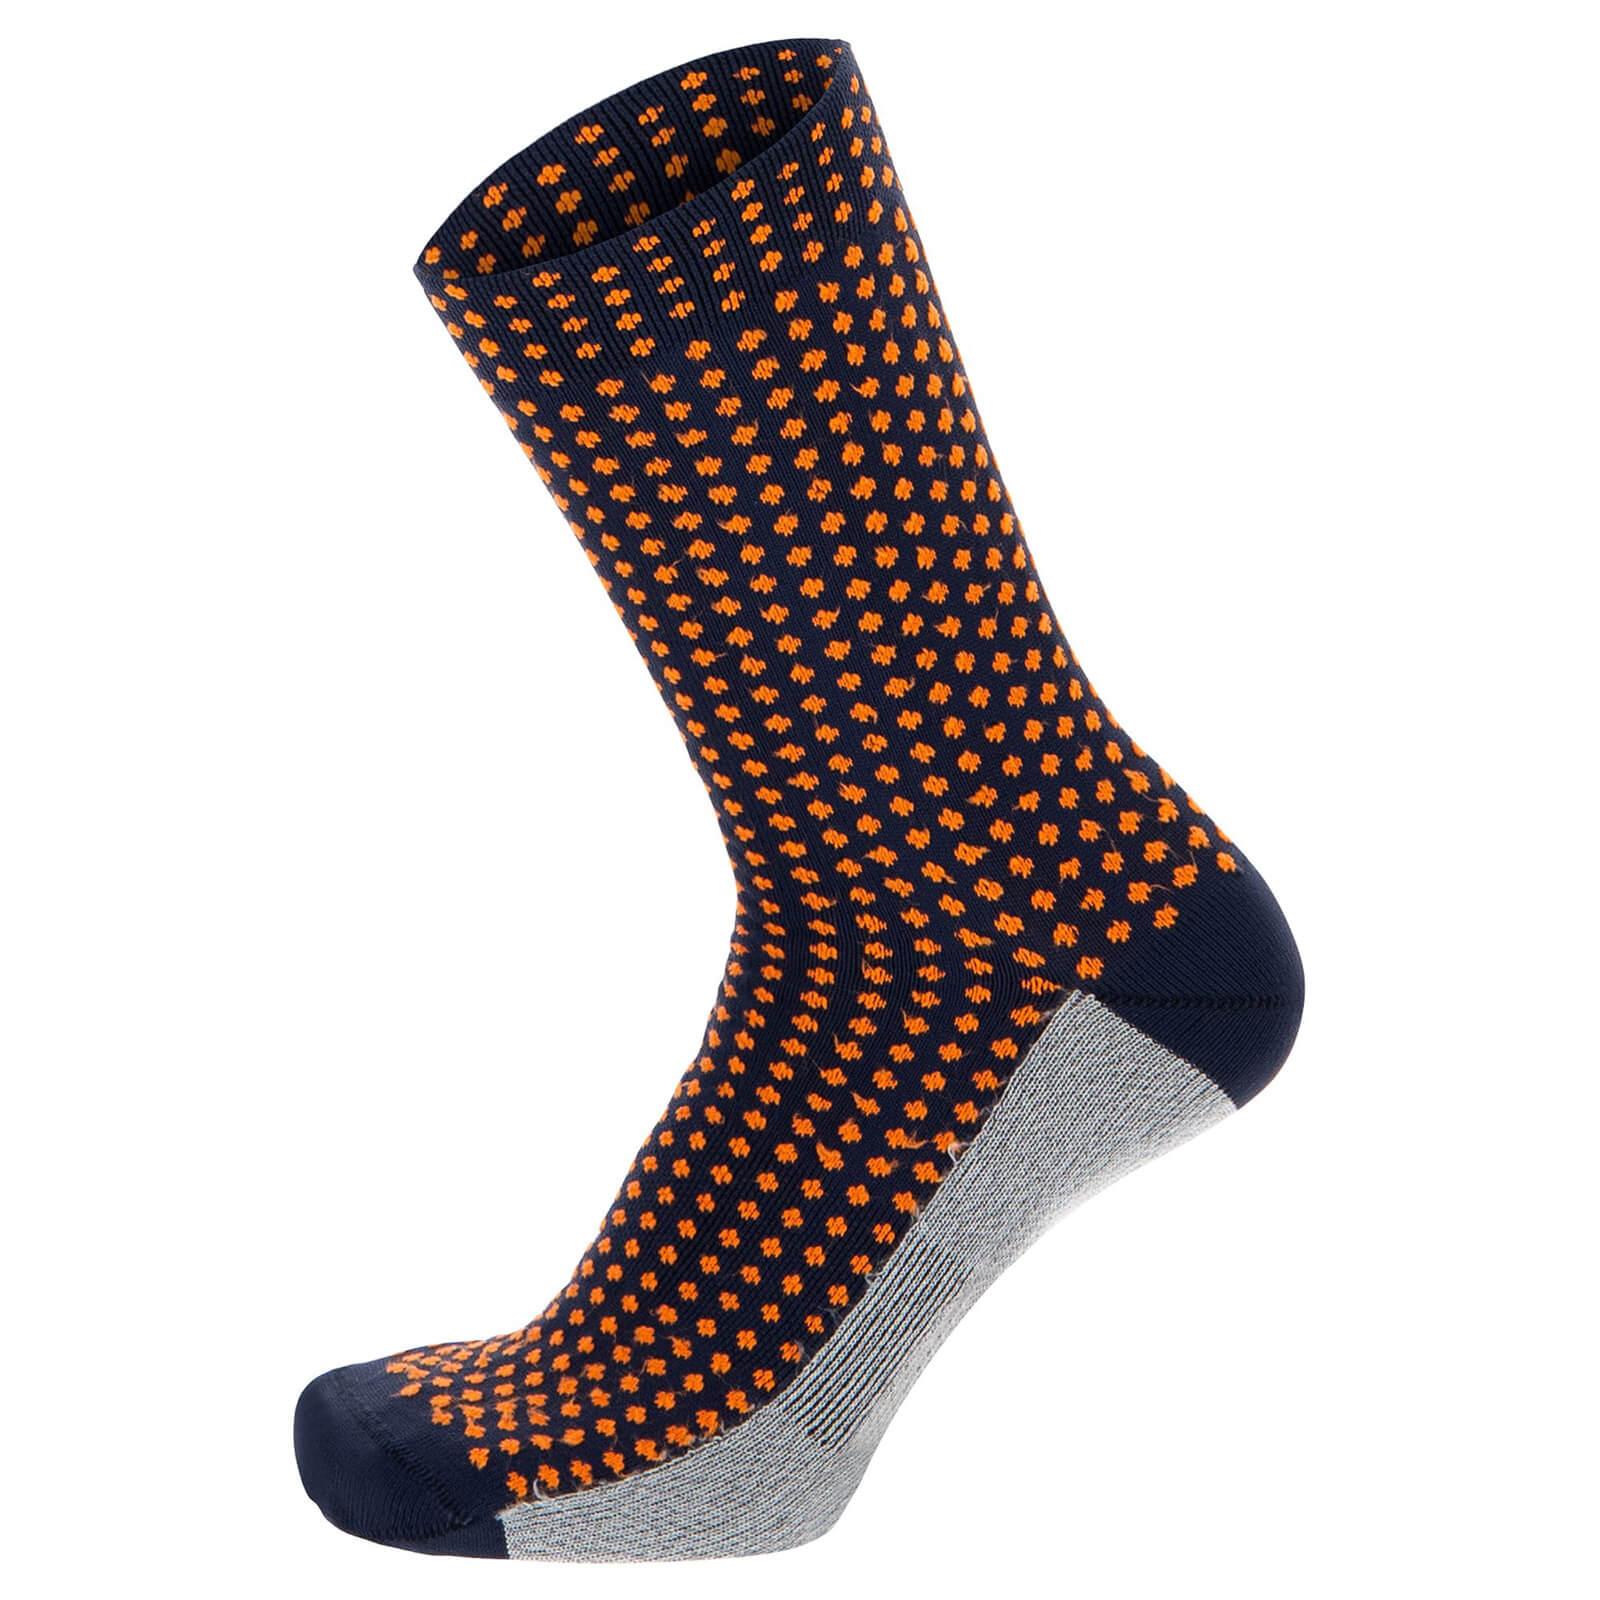 Santini Medium Profile Socks - XS - Nautica Blue